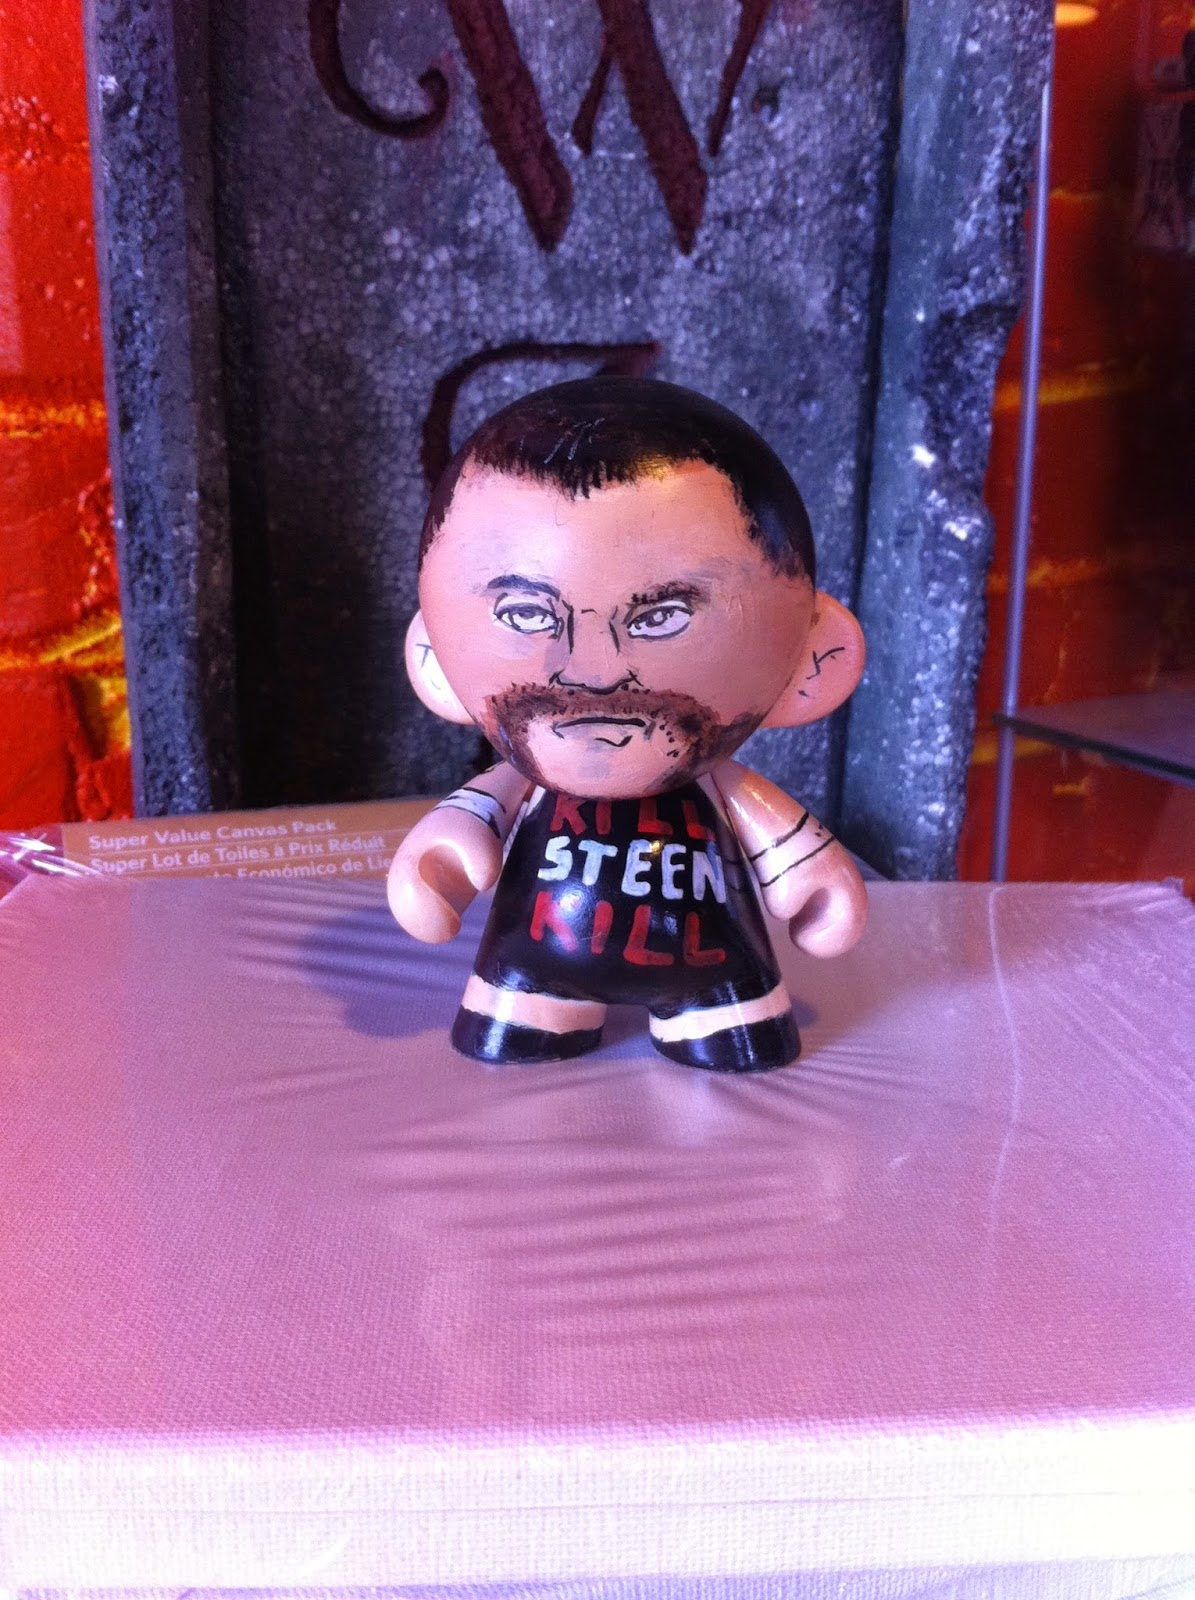 kevin steen, pro wrestler, HWA, WWE, WWe toys, toys, vinyl toys